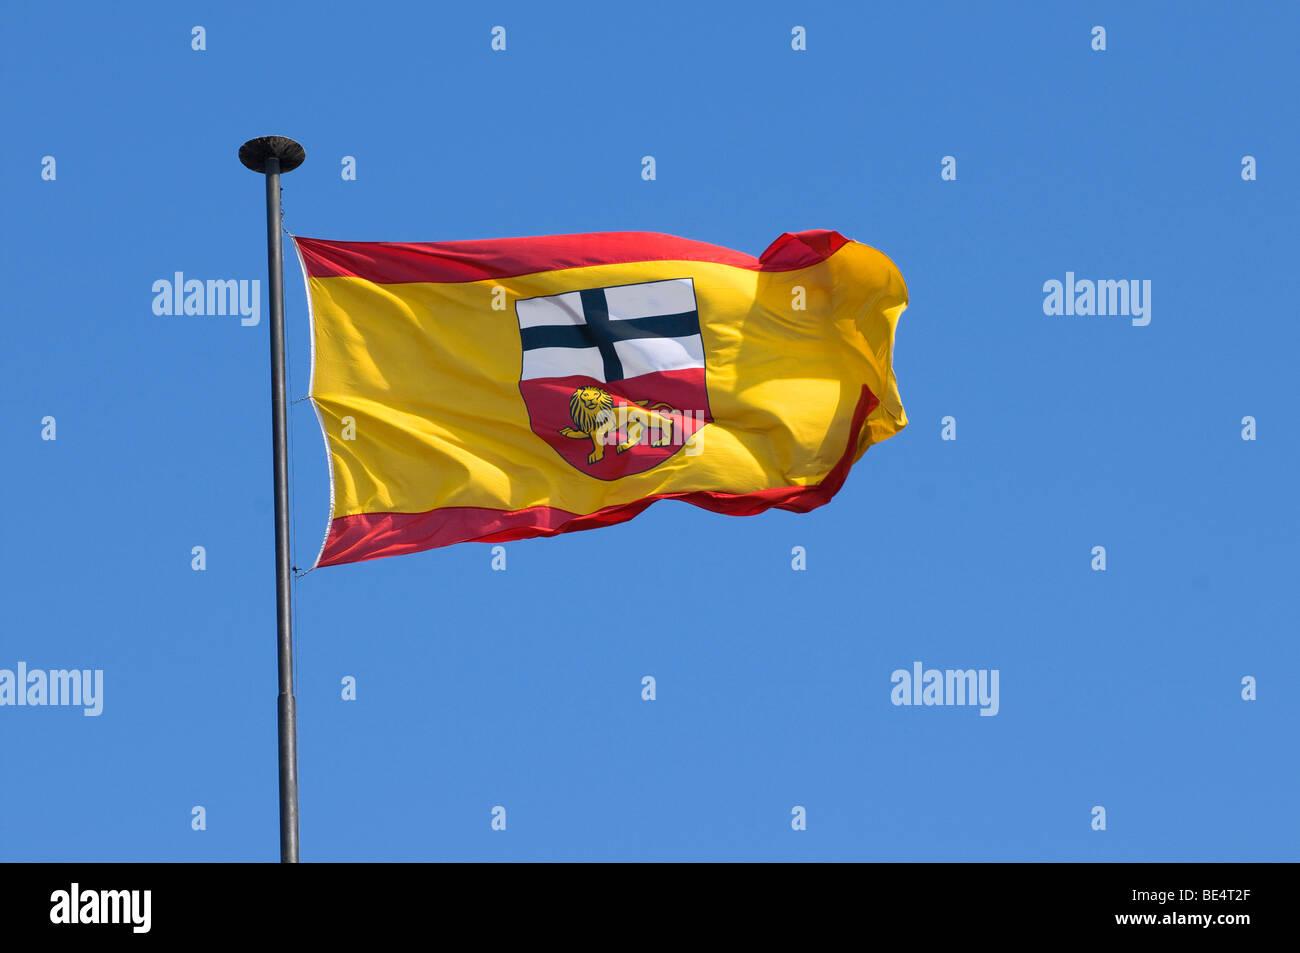 Fluttering flag of the city of Bonn, North Rhine-Westphalia, Germany, Europe - Stock Image